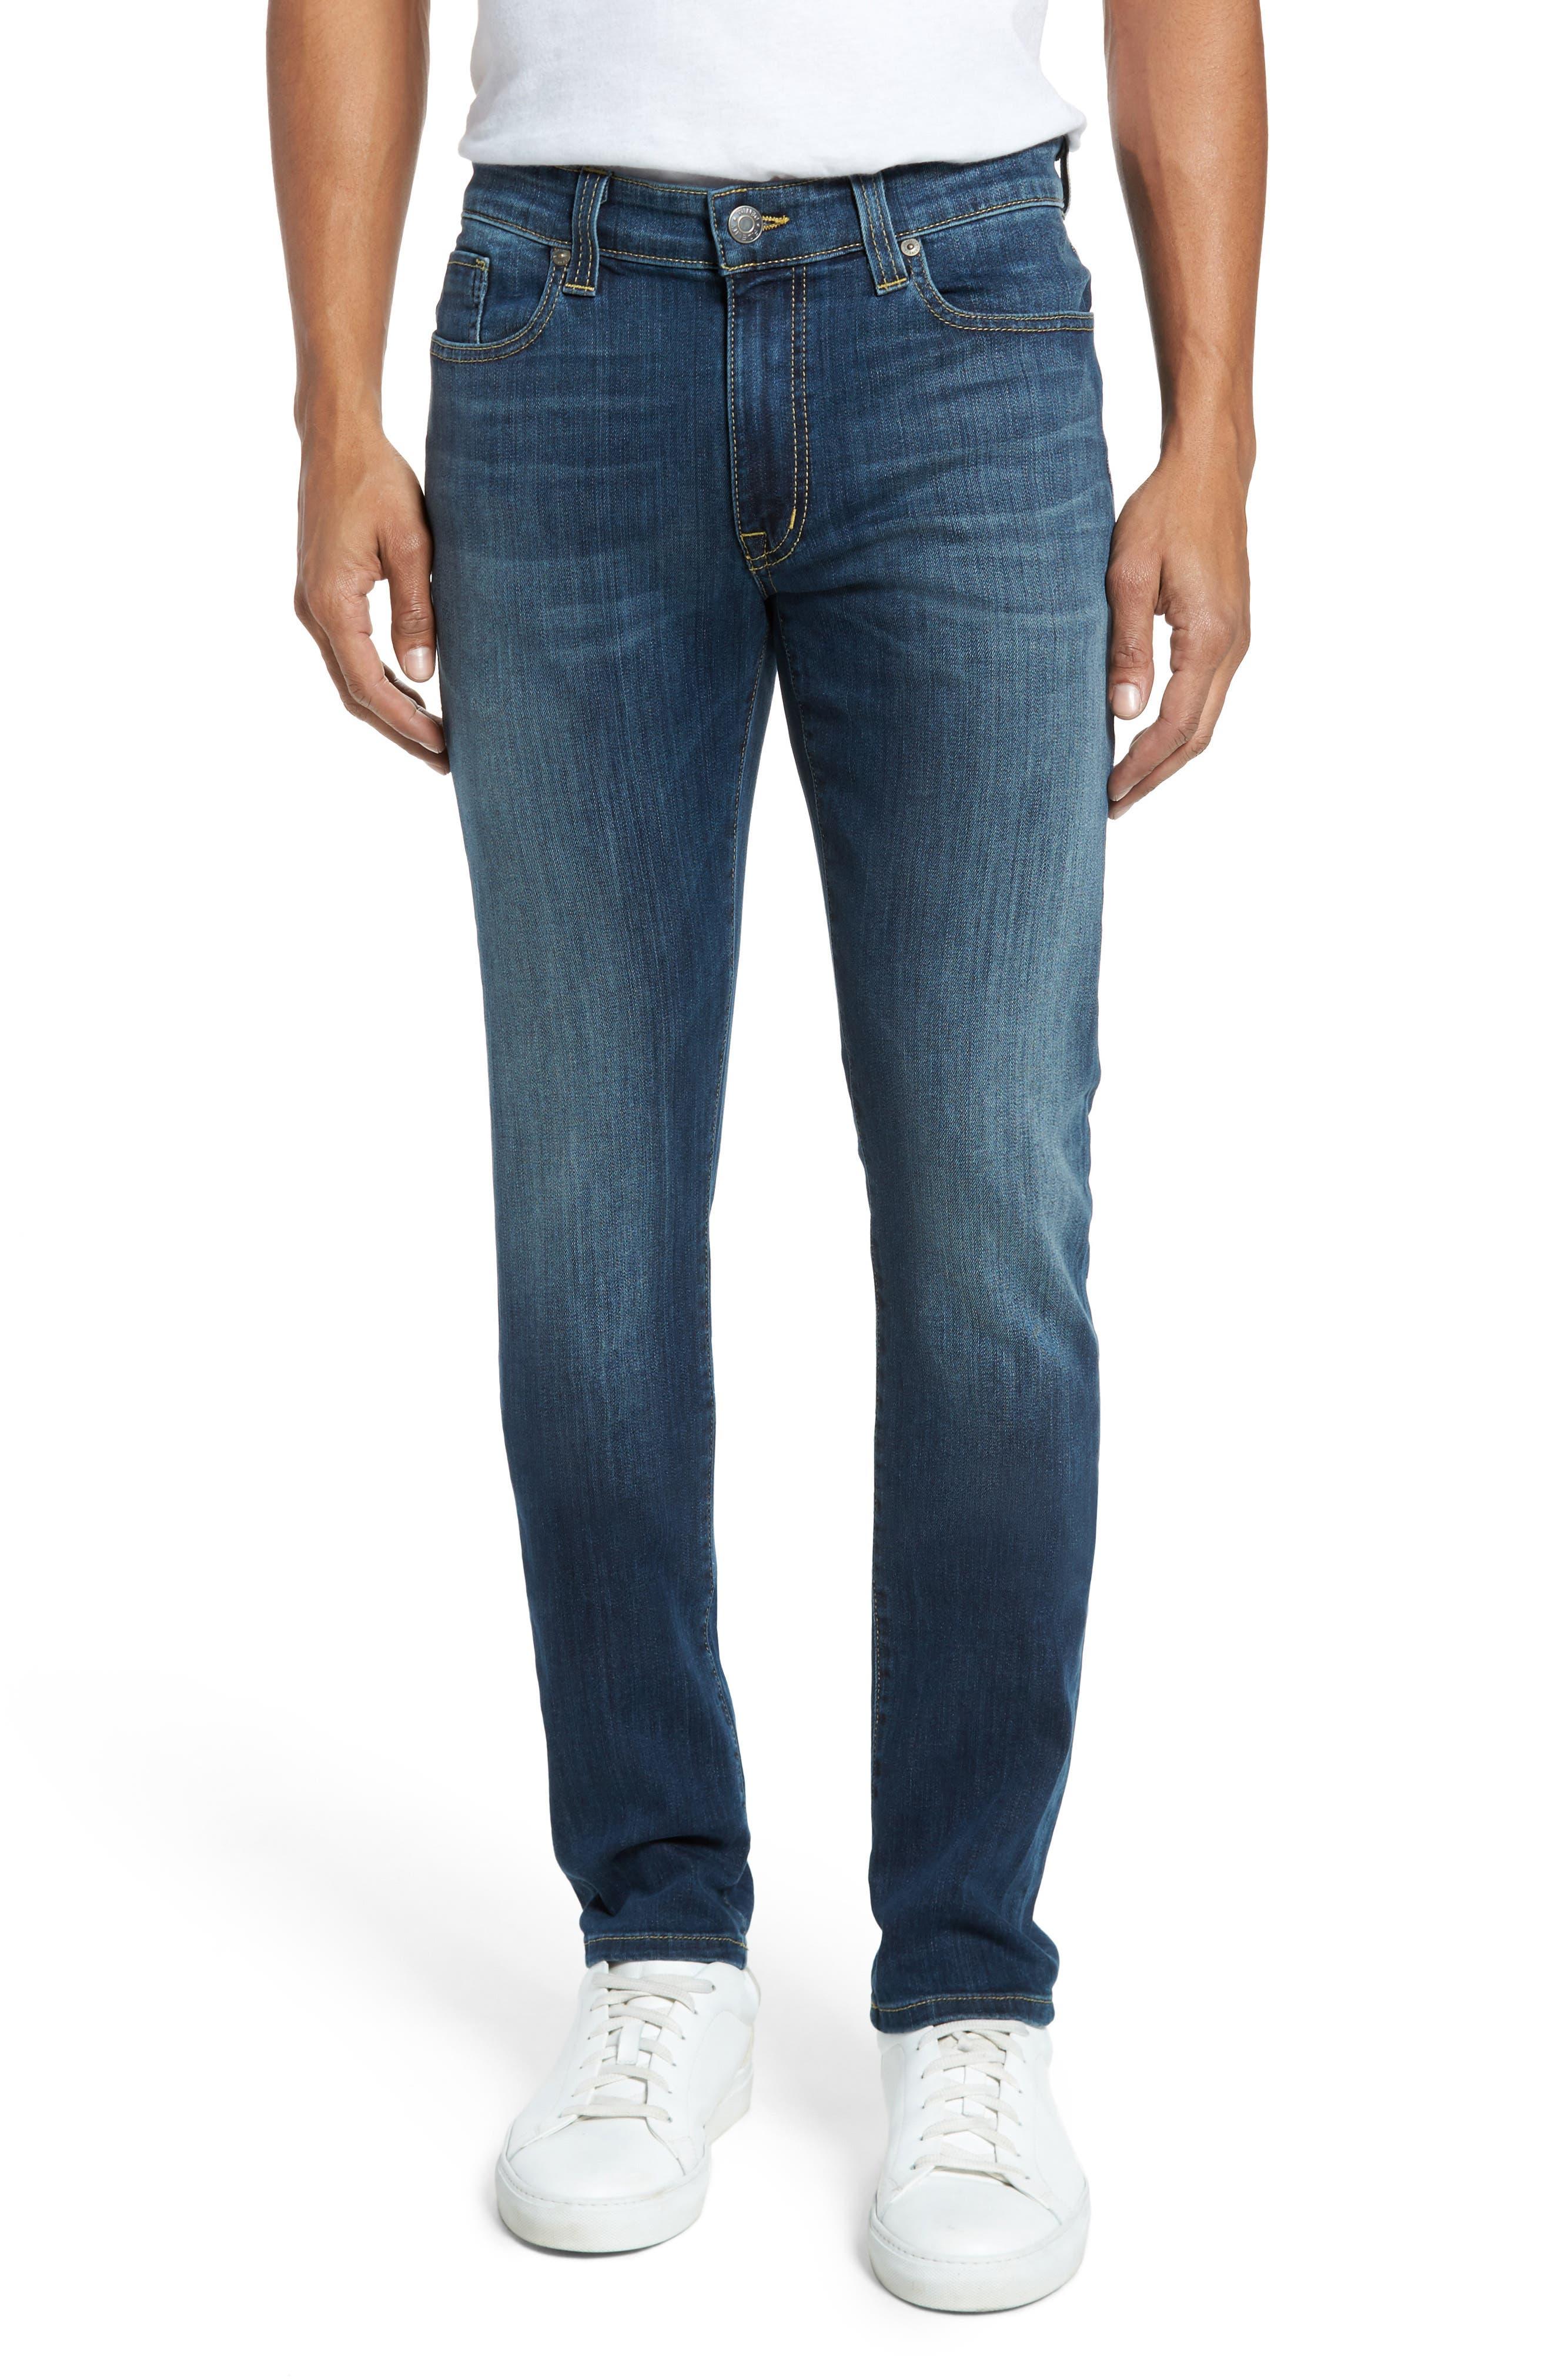 Fidelity Denim Torino Slim Fit Jeans (Providence)